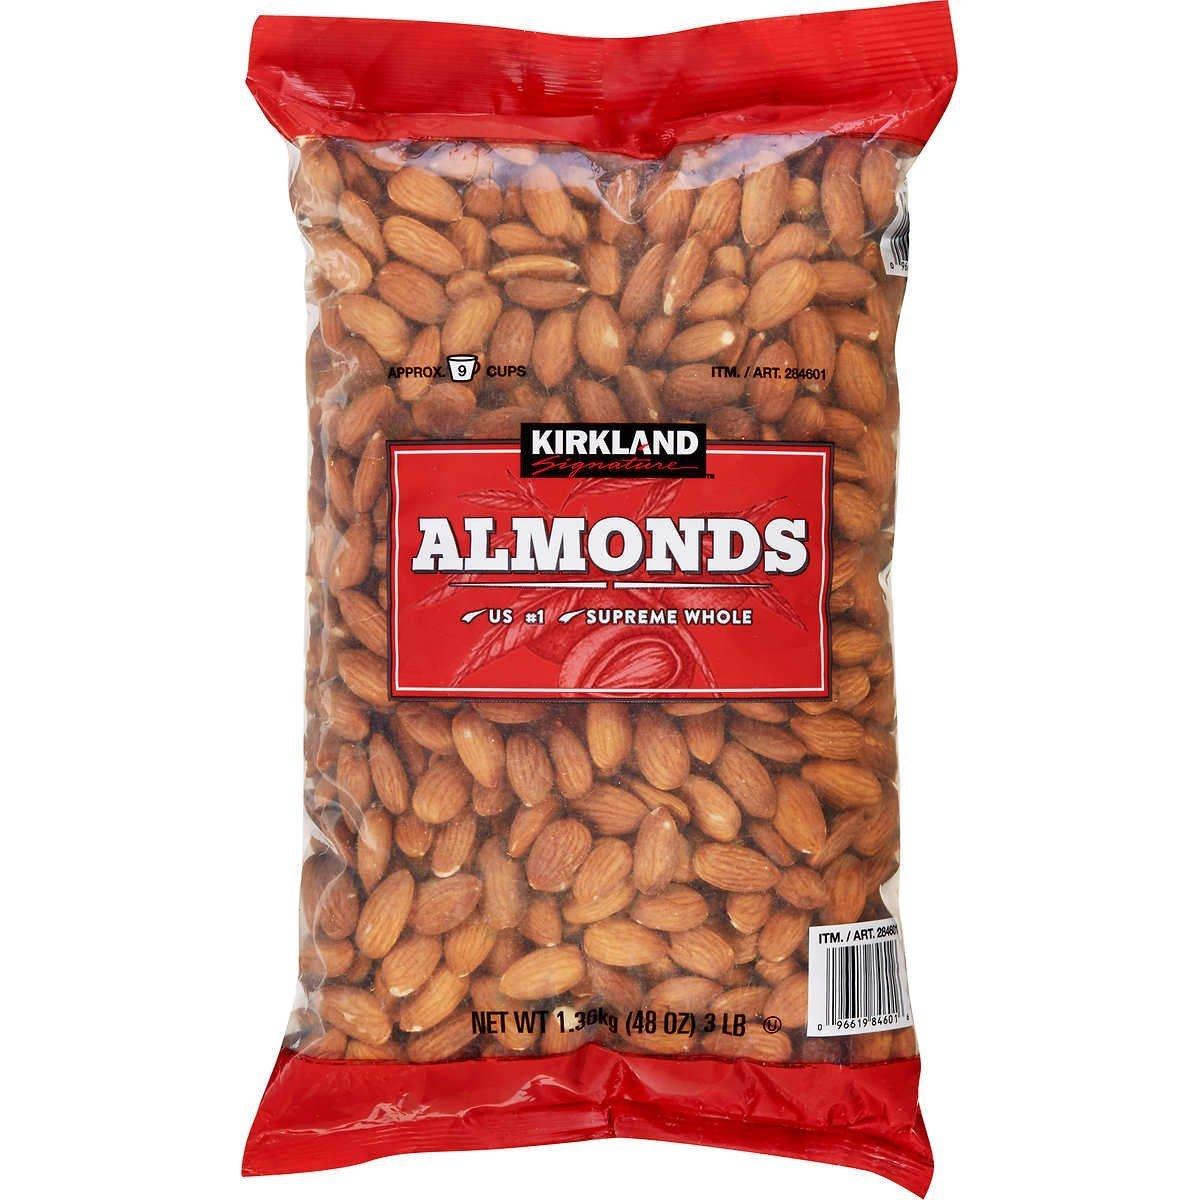 Kirkland Signature Nuts, Almonds, 48 Ounce by Kirkland